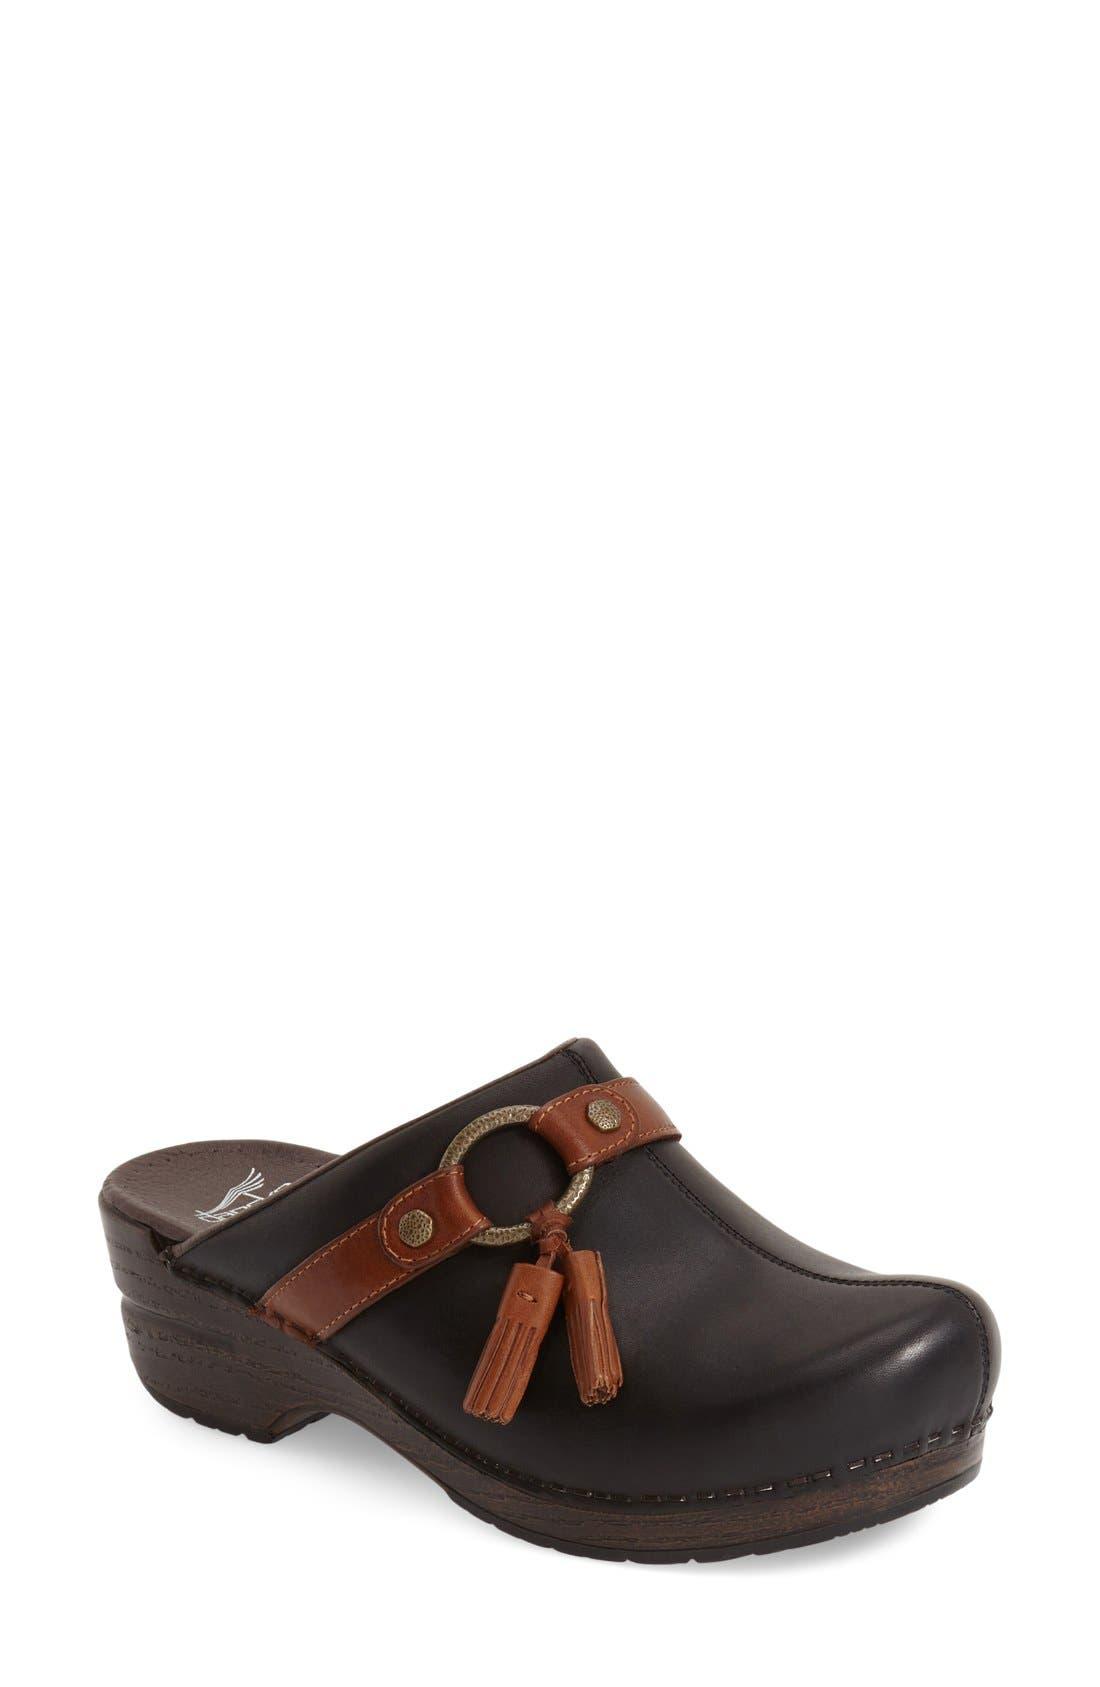 'Shandi' Clog,                         Main,                         color, Black Leather